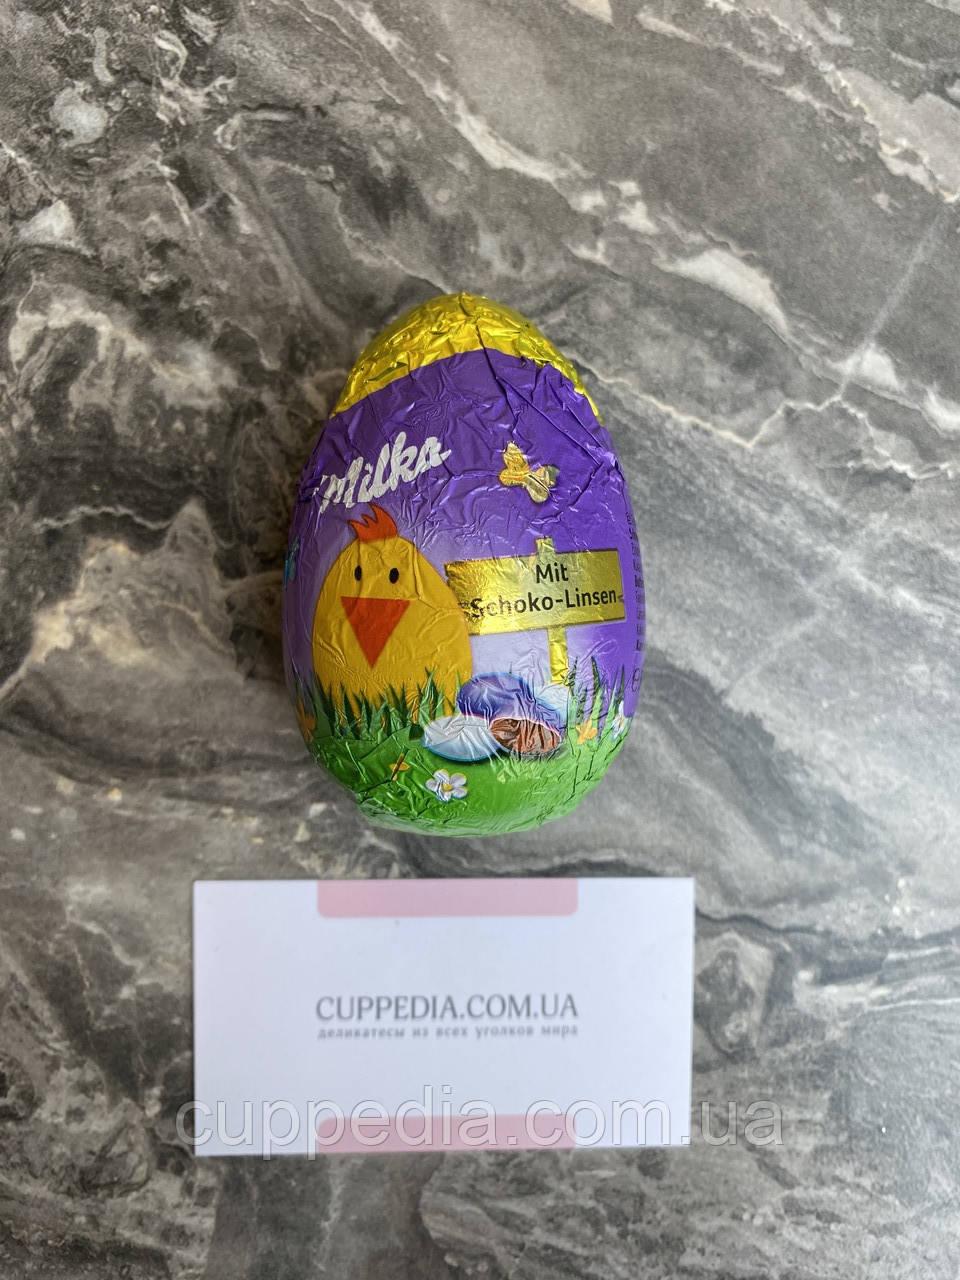 Шоколадне яйце Milka Mit Schoko - Linsen 50 грм